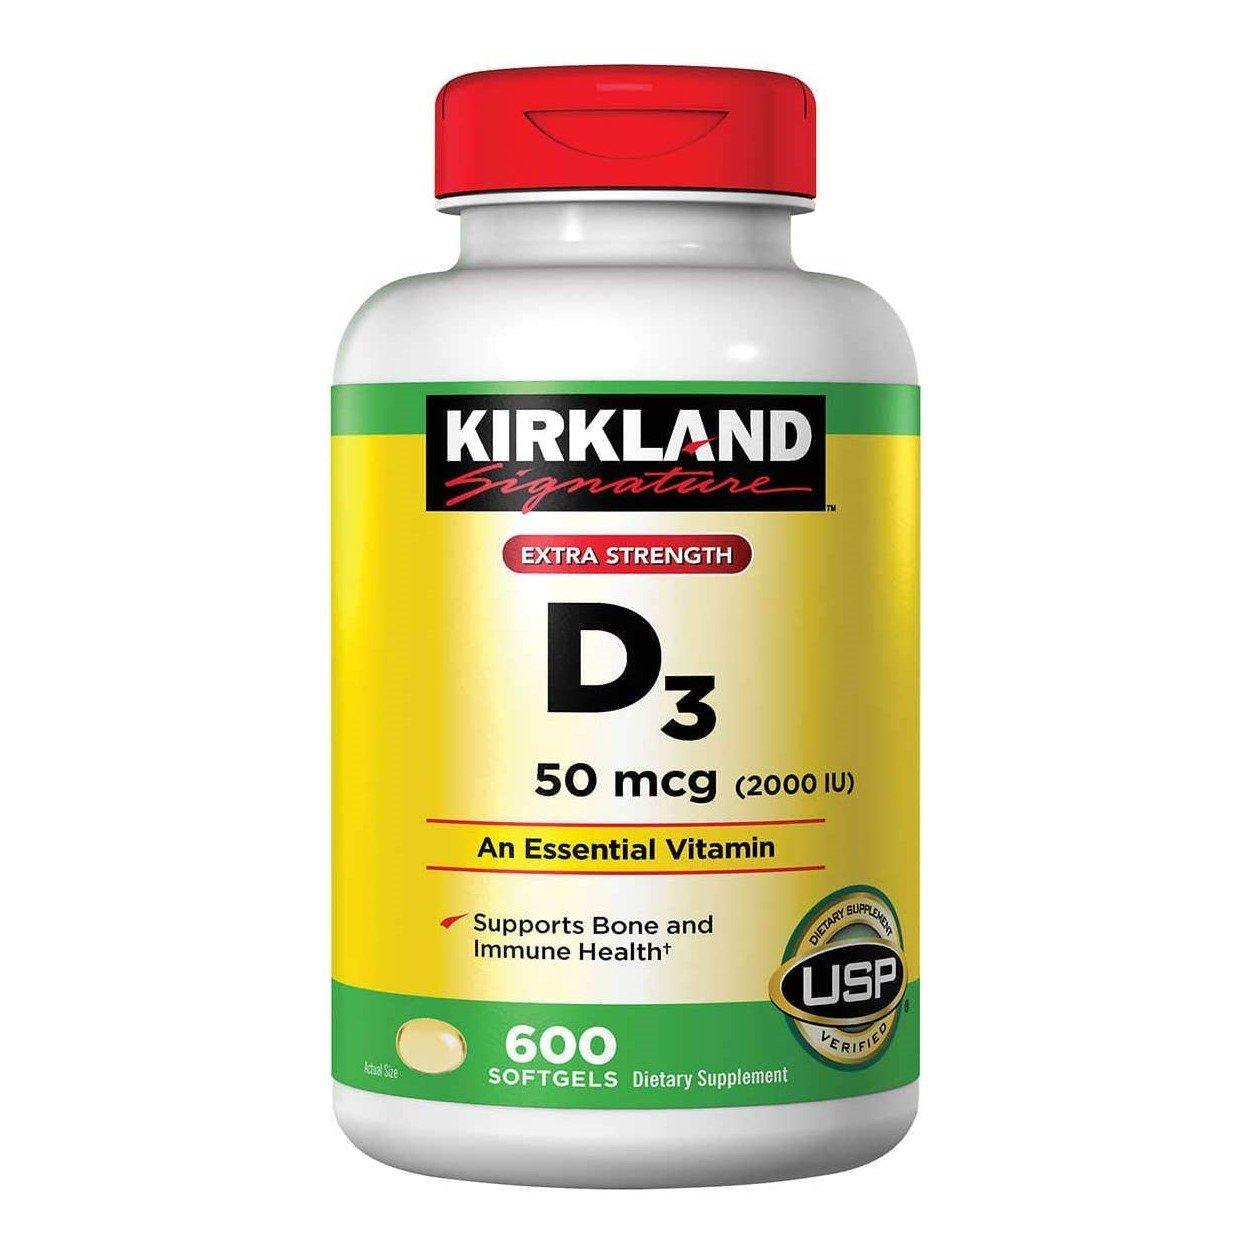 Kirkland Signature Extra Strength Vitamin D3 50 mcg, 600 Softgels - Vitamin D Bone & Immune Health